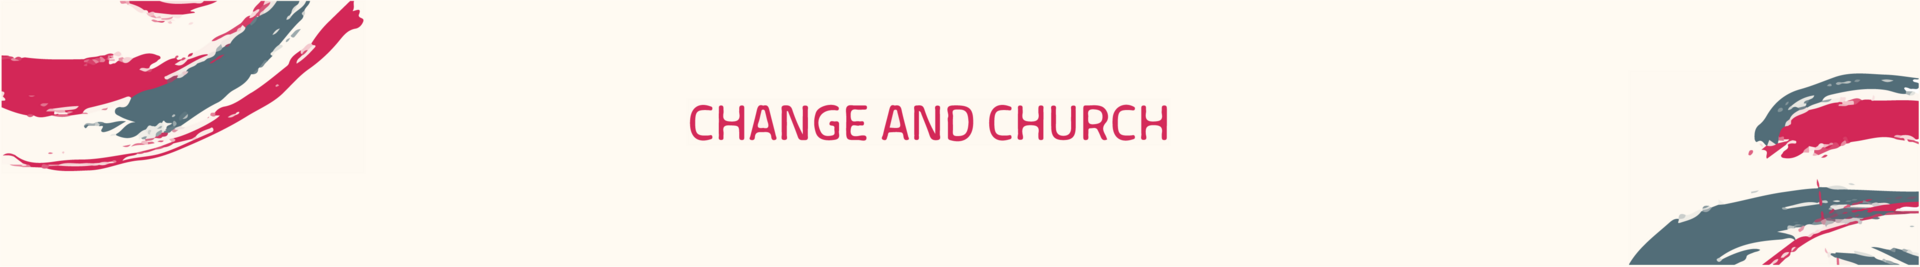 Symposium 'Samen leiding geven aan verandering'